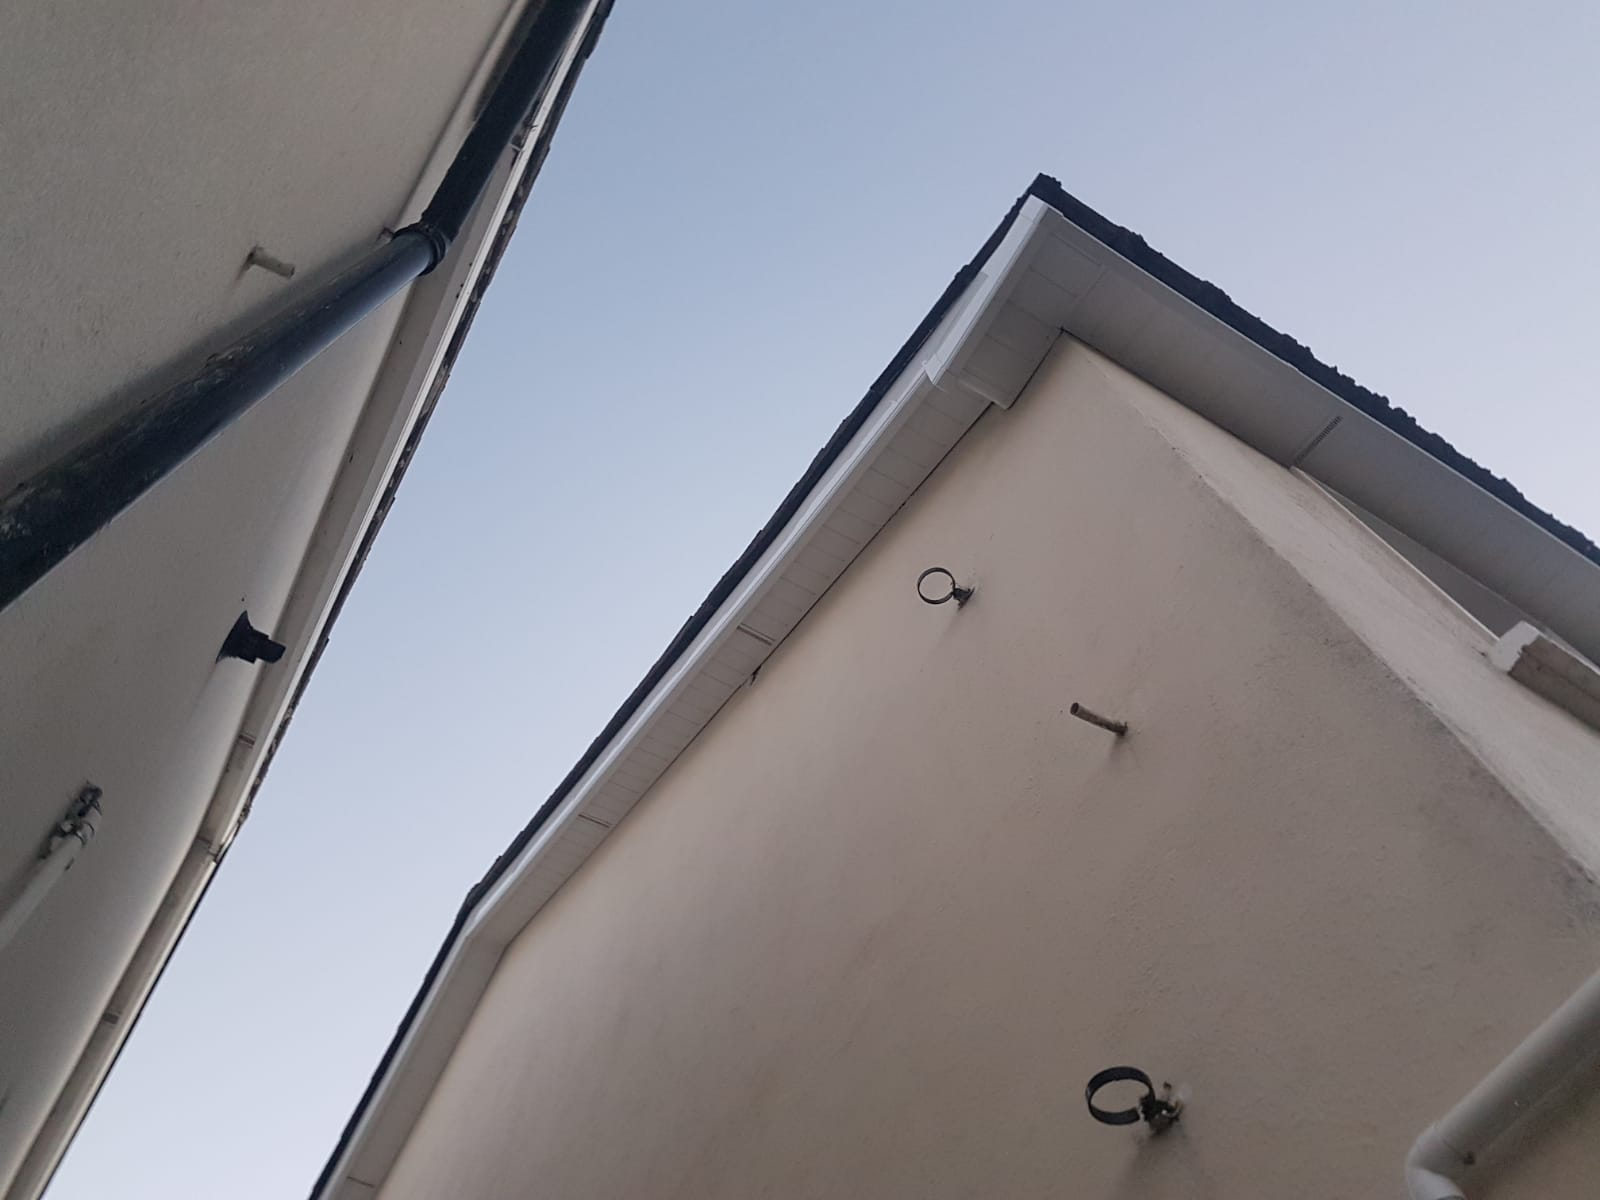 Guttering Repairs in Kilmead, Co. Kildare